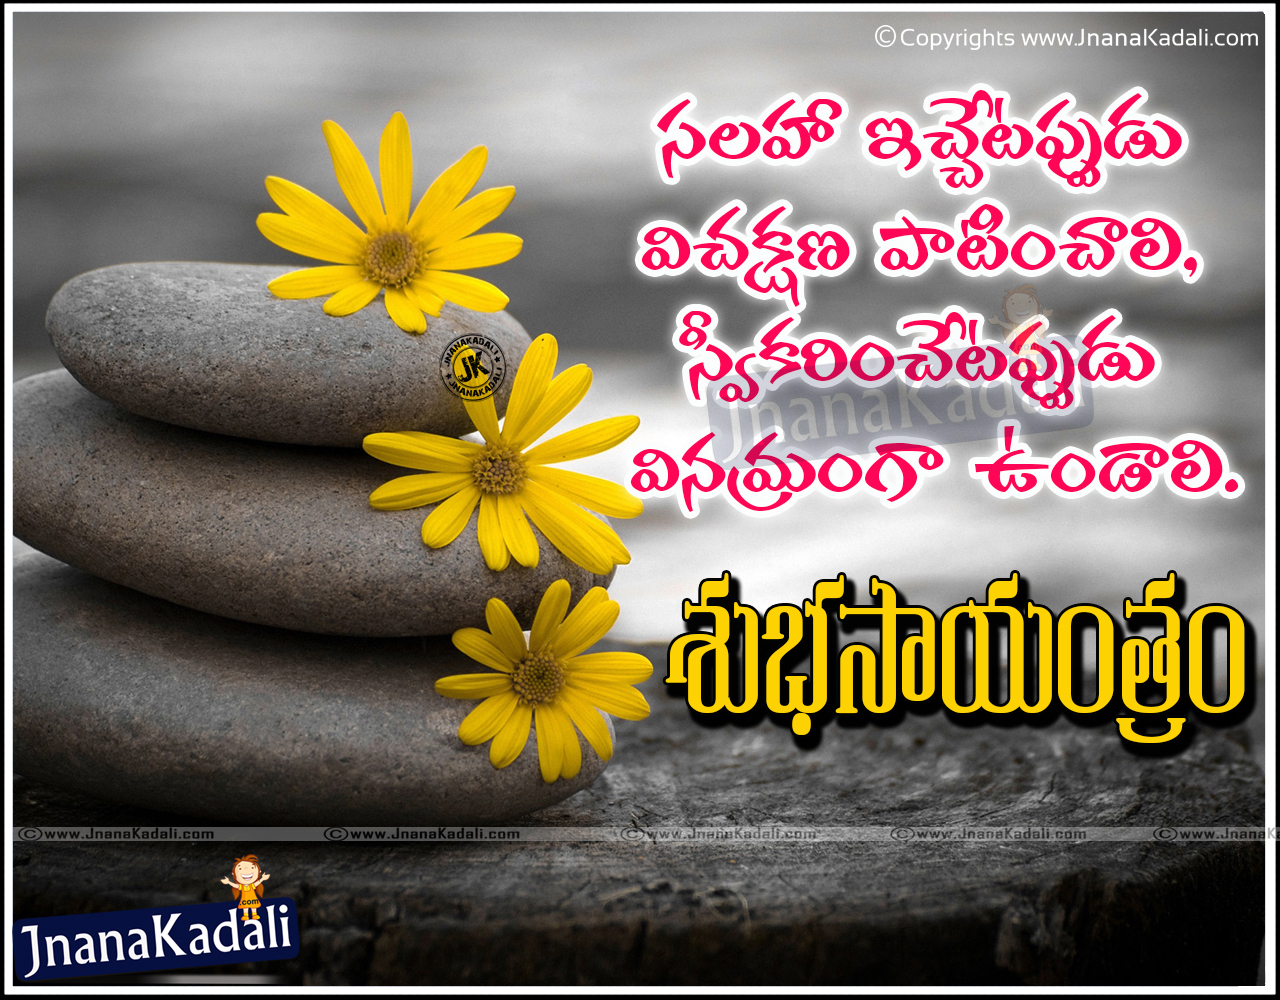 New Telugu Language Good Evening Quotes Wallpapers online, Top Telugu ...